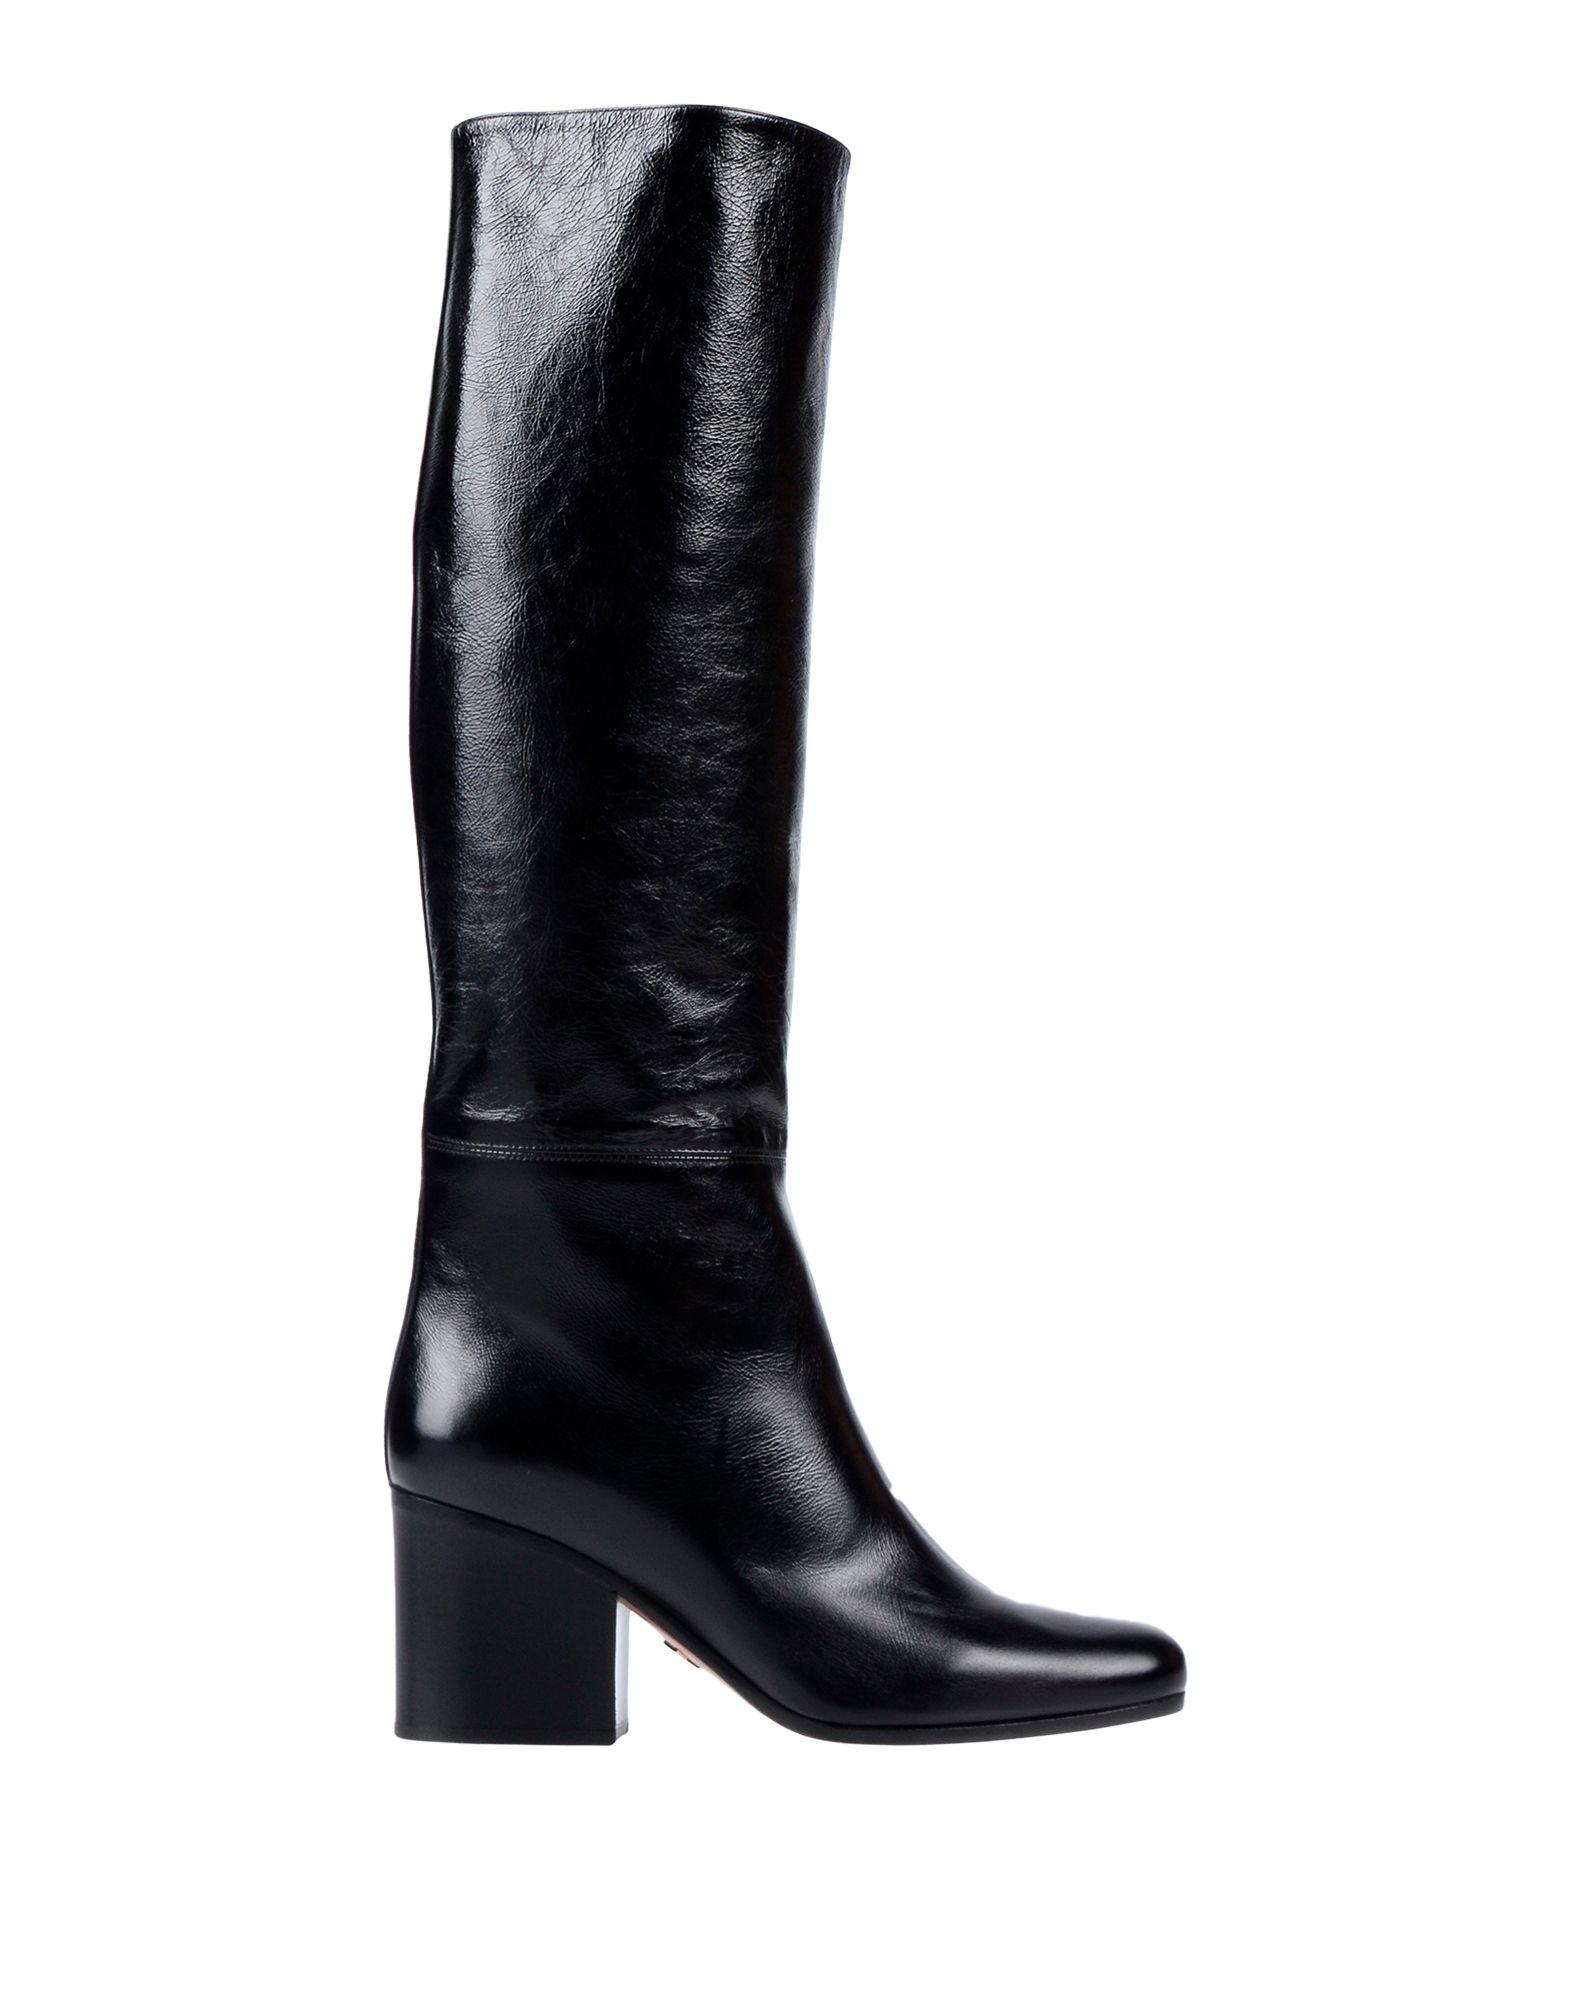 8b99809609 Dior women's shoes, designer footwear on sale   YOOX